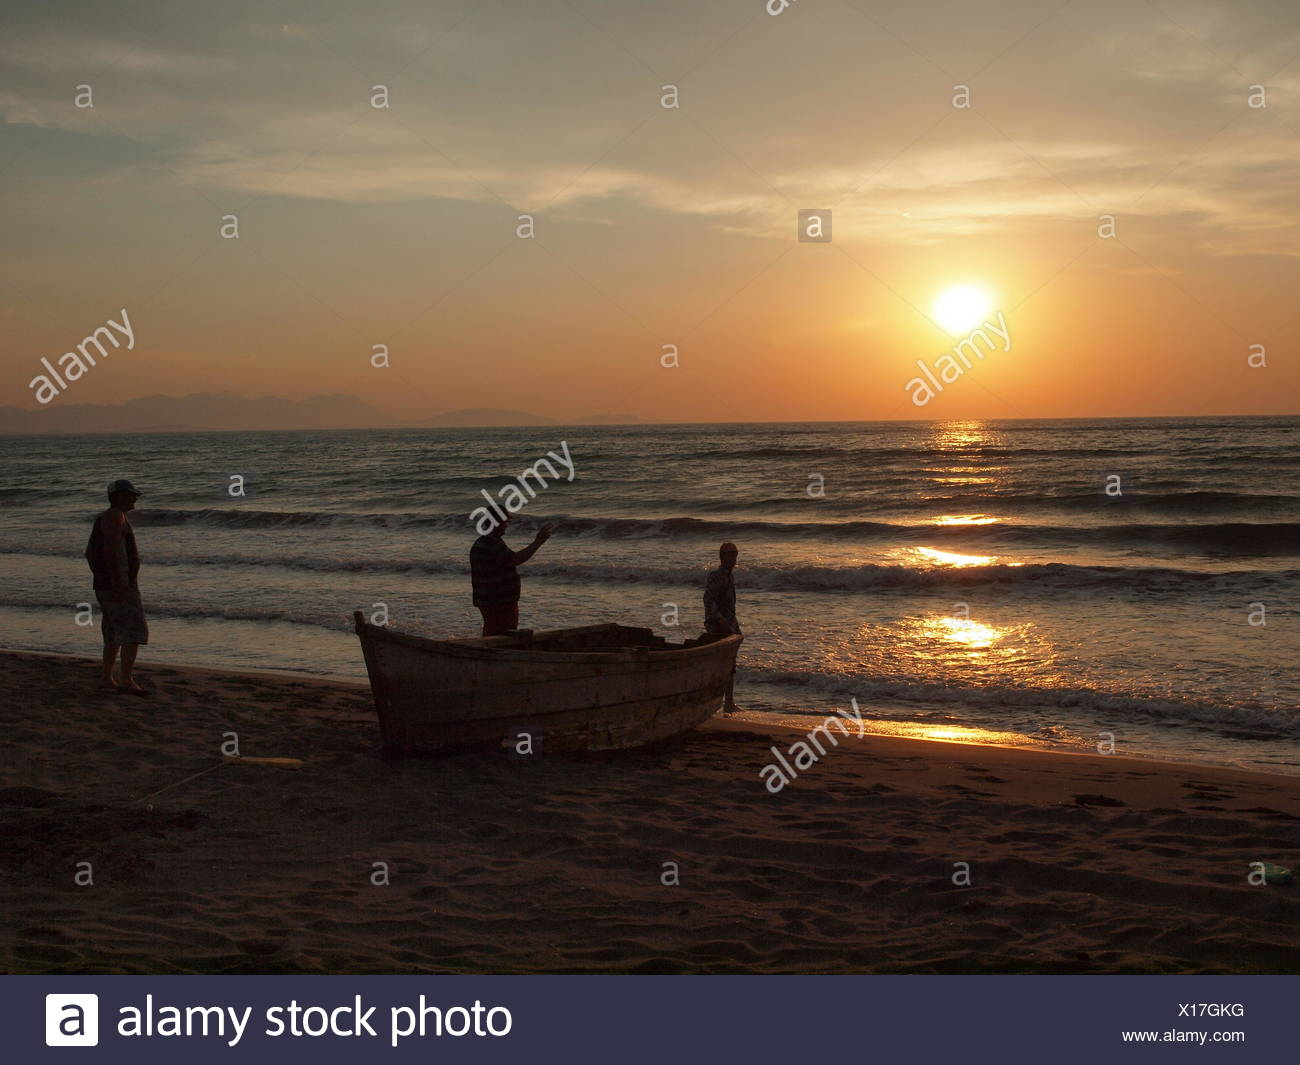 Fishermen in Albania at sunset - Stock Image